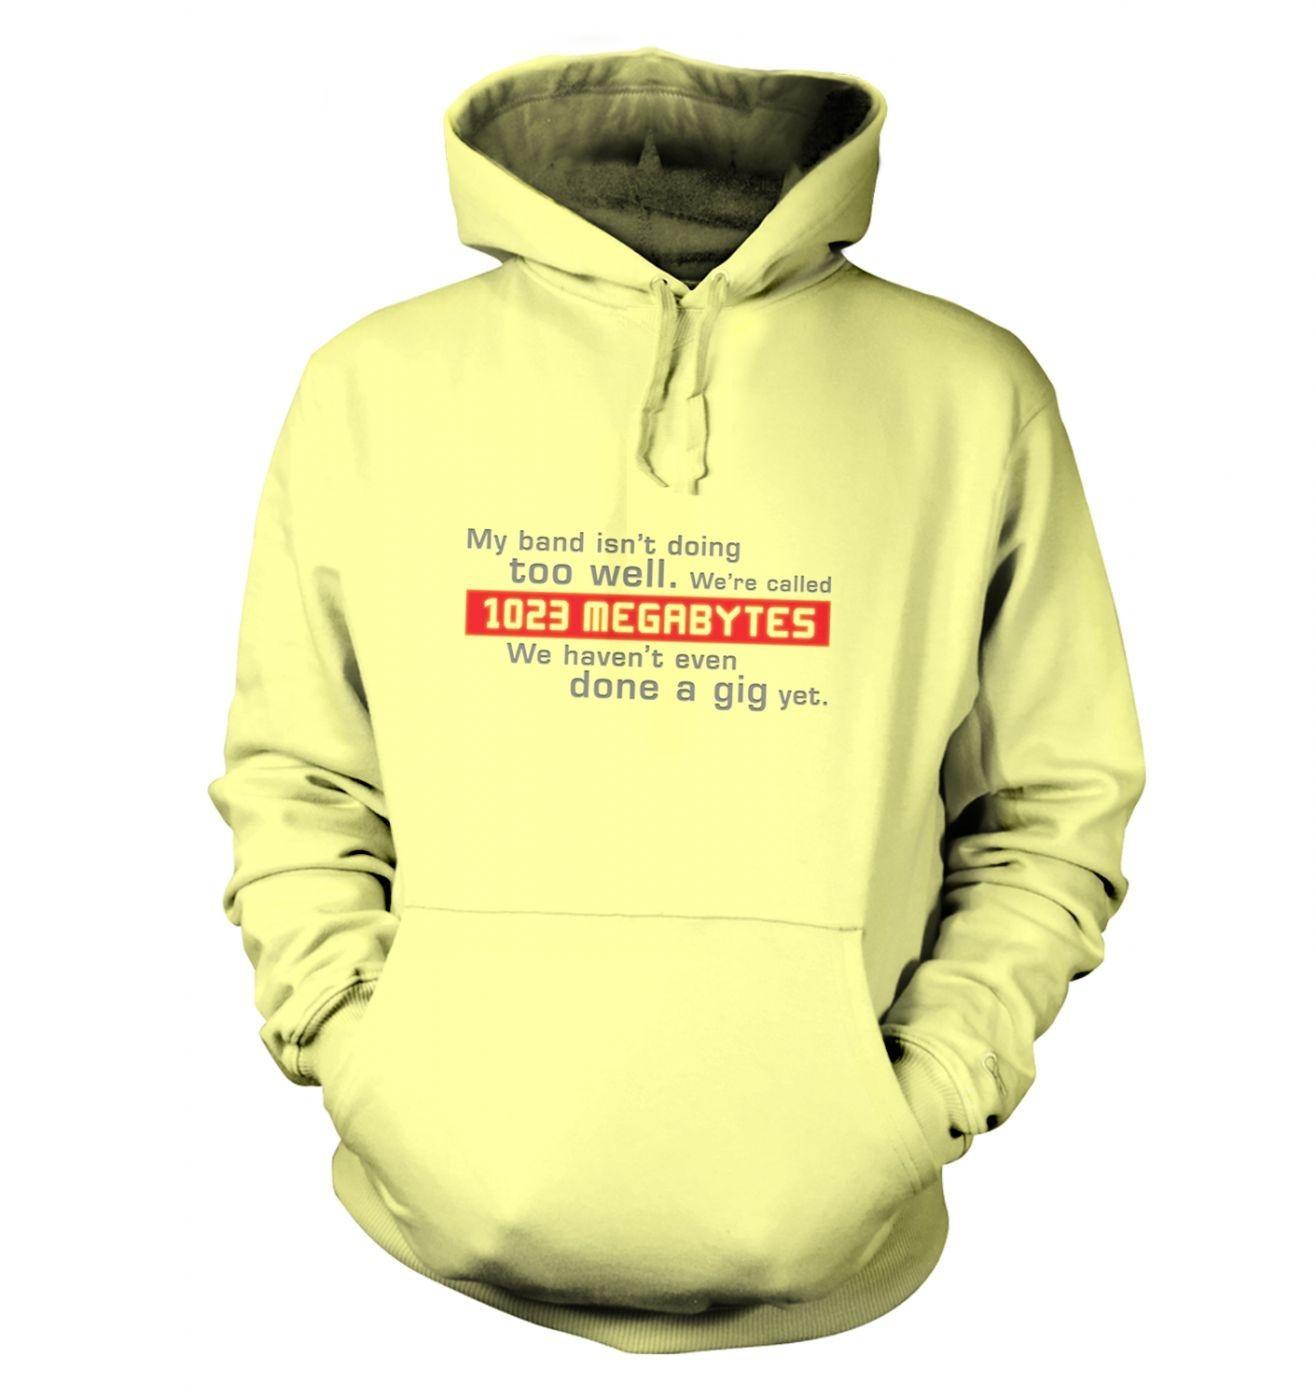 1023 Megabytes hoodie